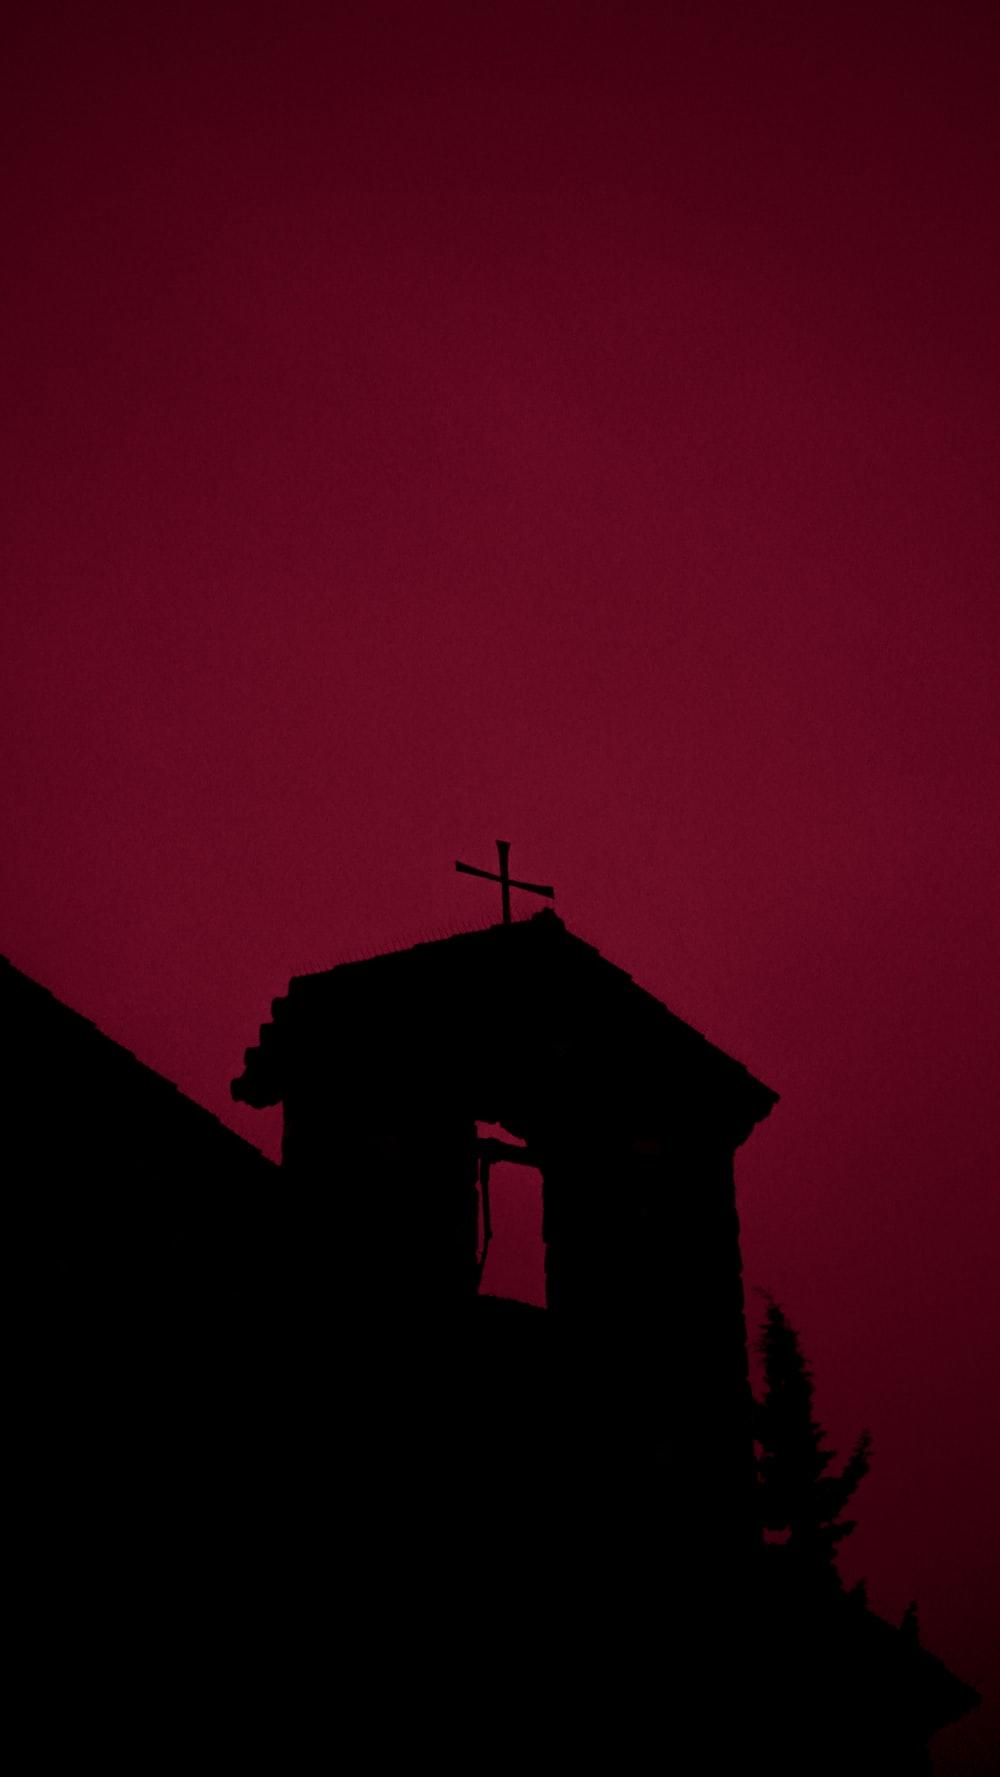 cross during nighttime